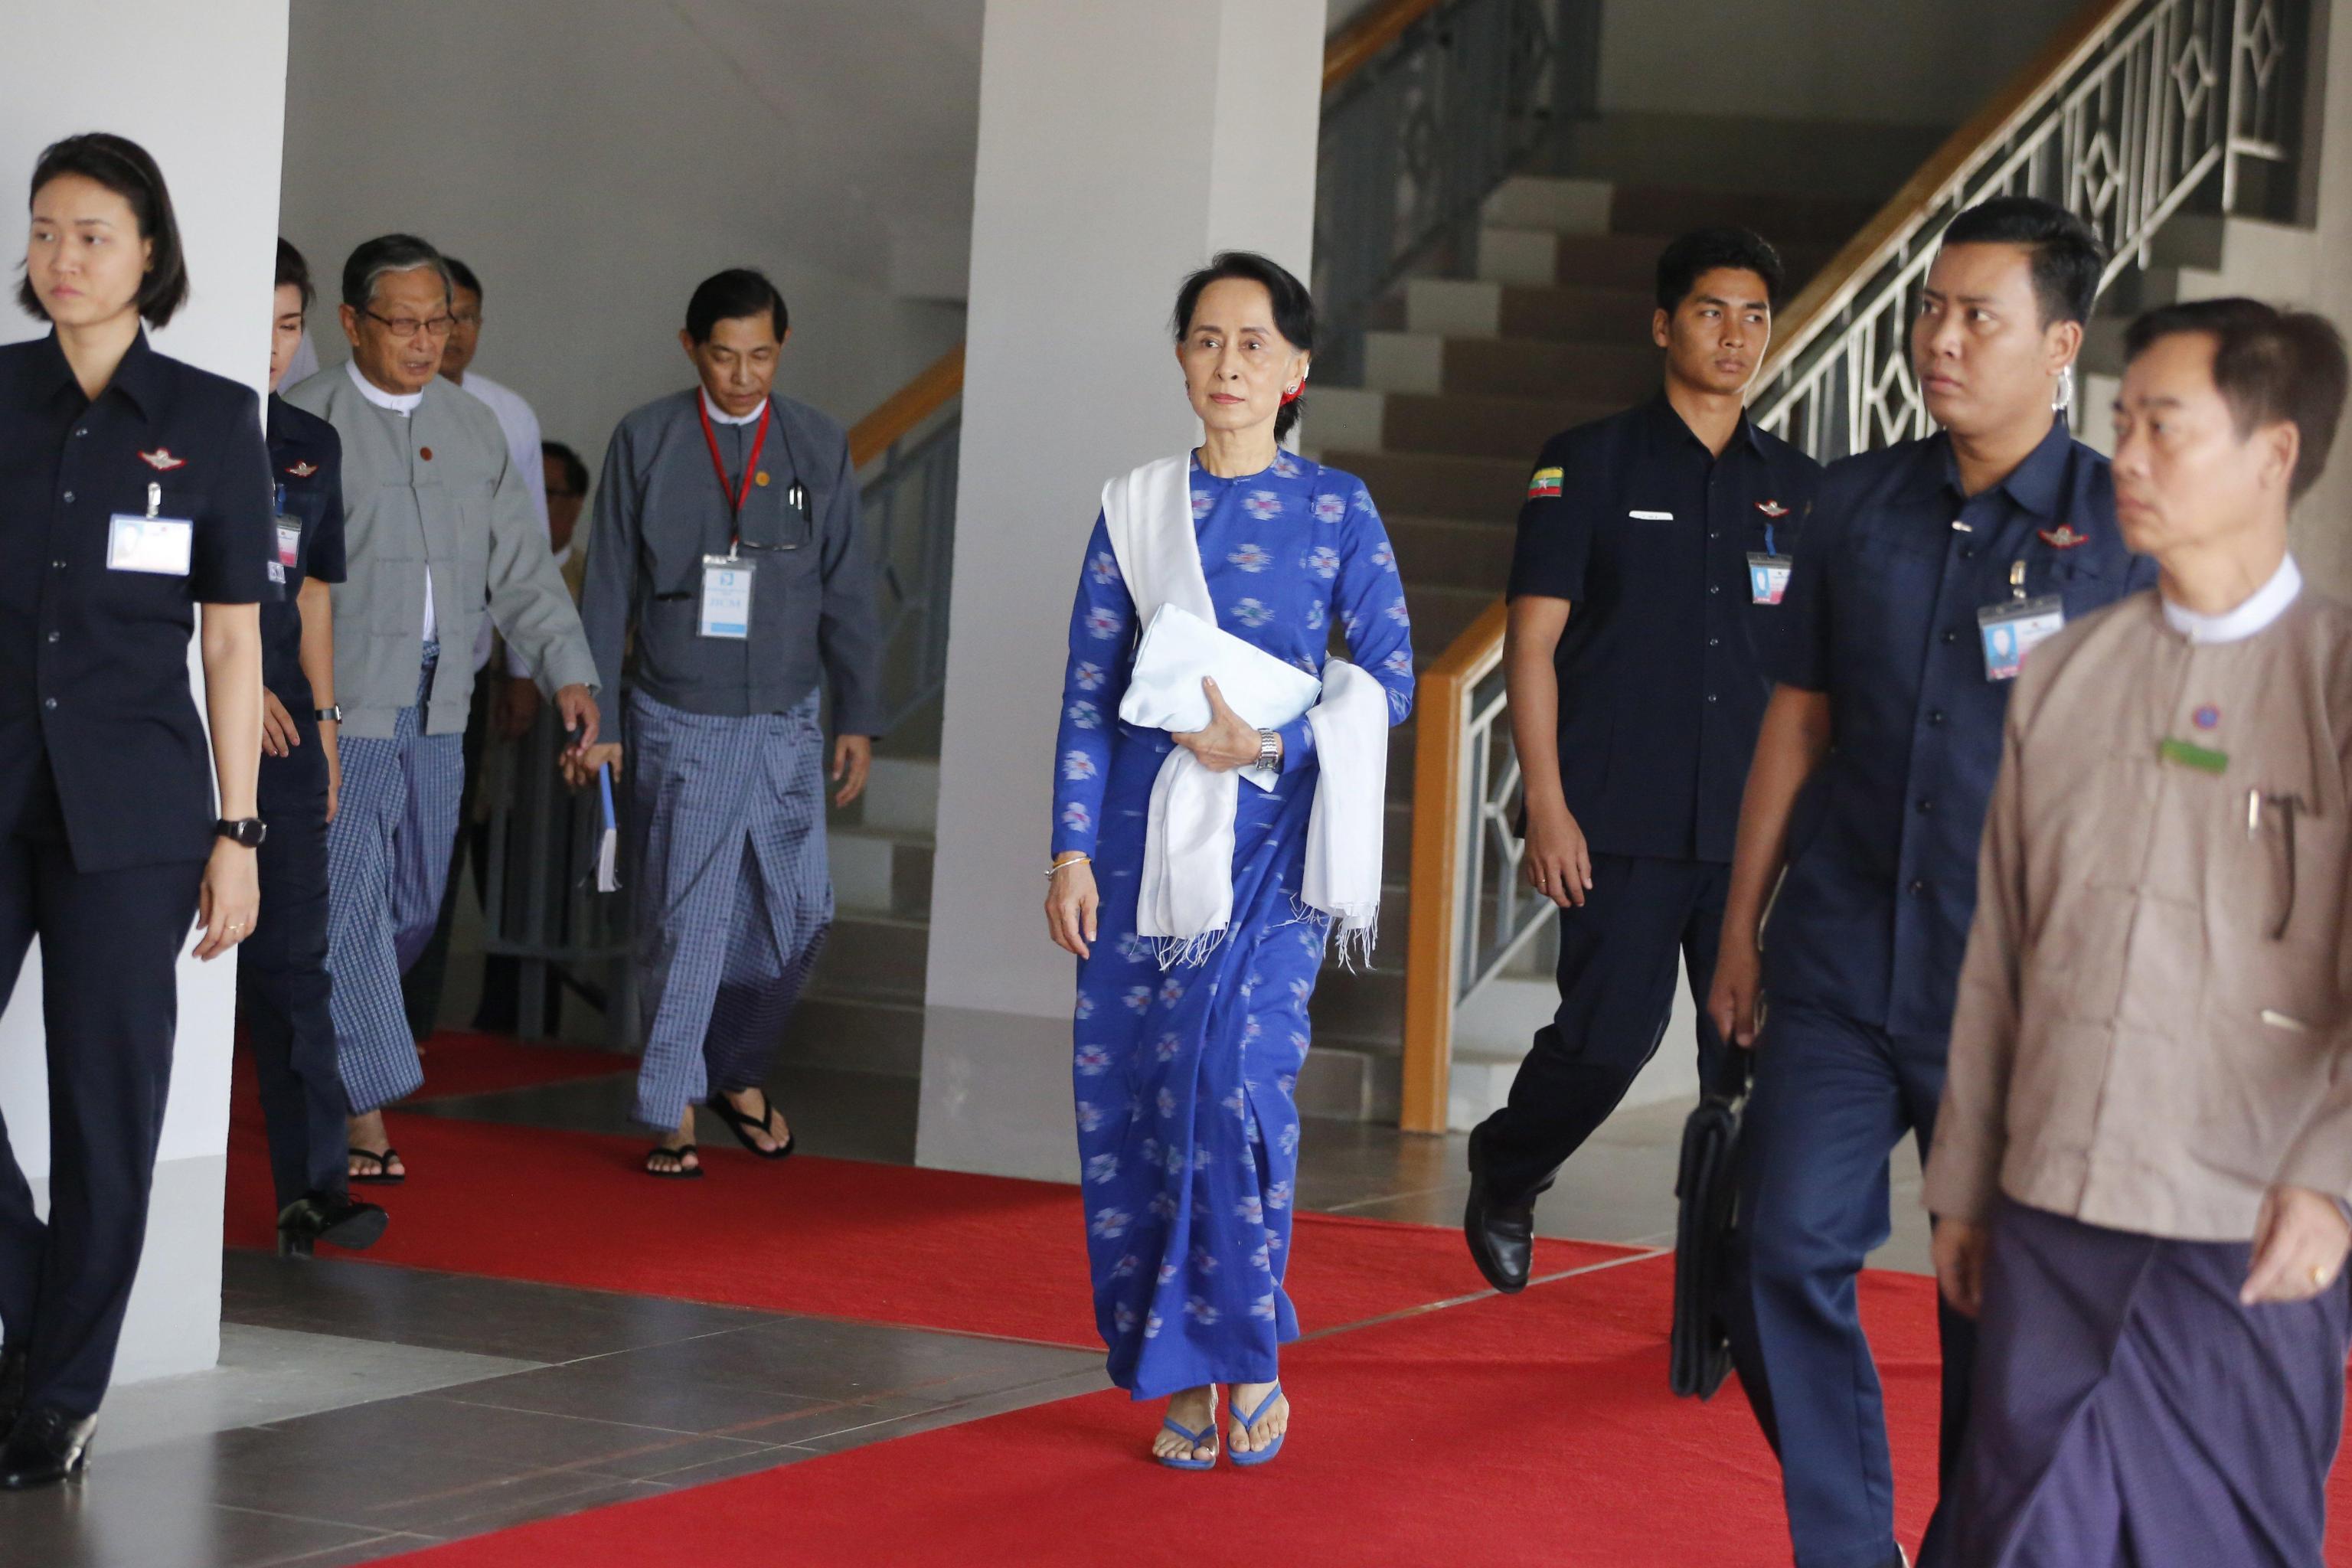 Oxford ritira riconoscimento a Suu Kyi